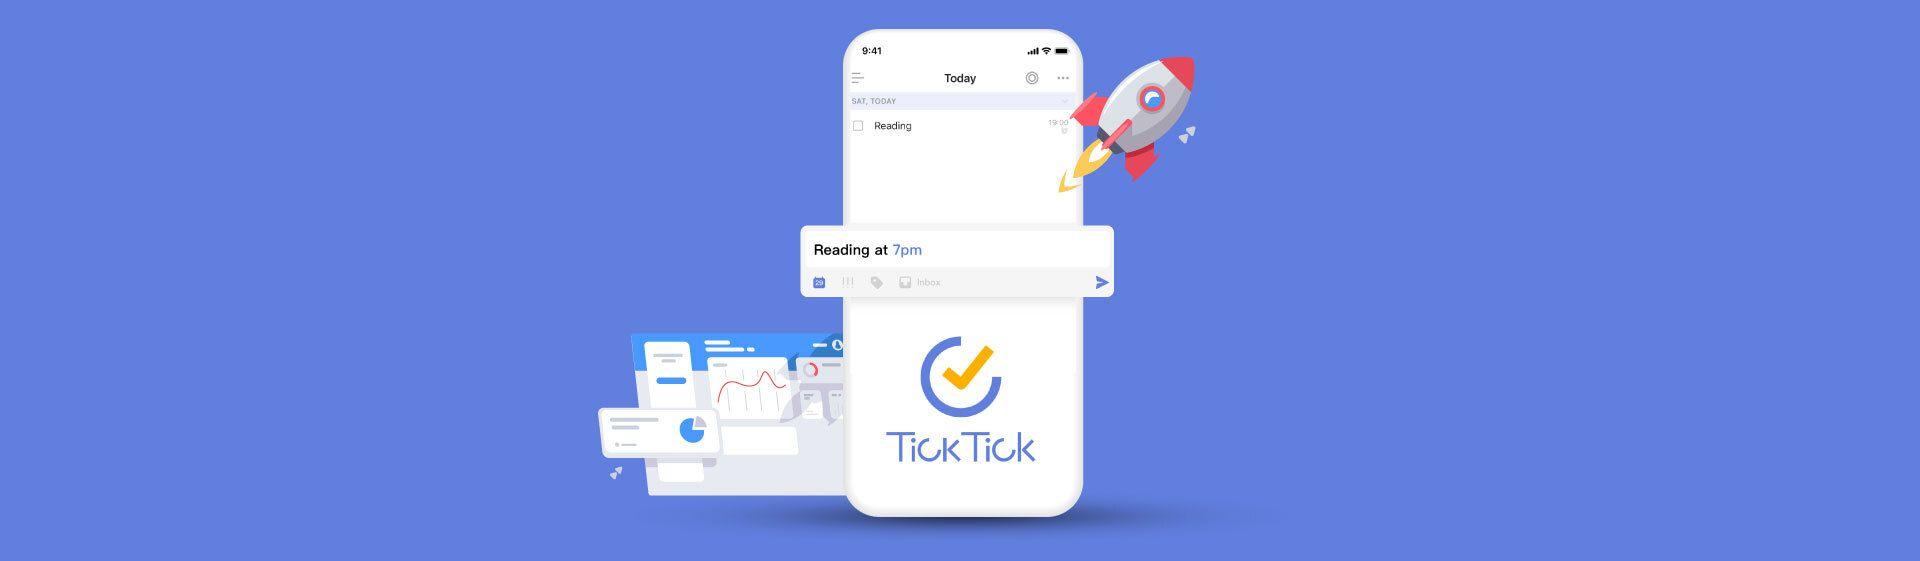 TickTick: aplicativo multiplataforma para gerenciar tarefas